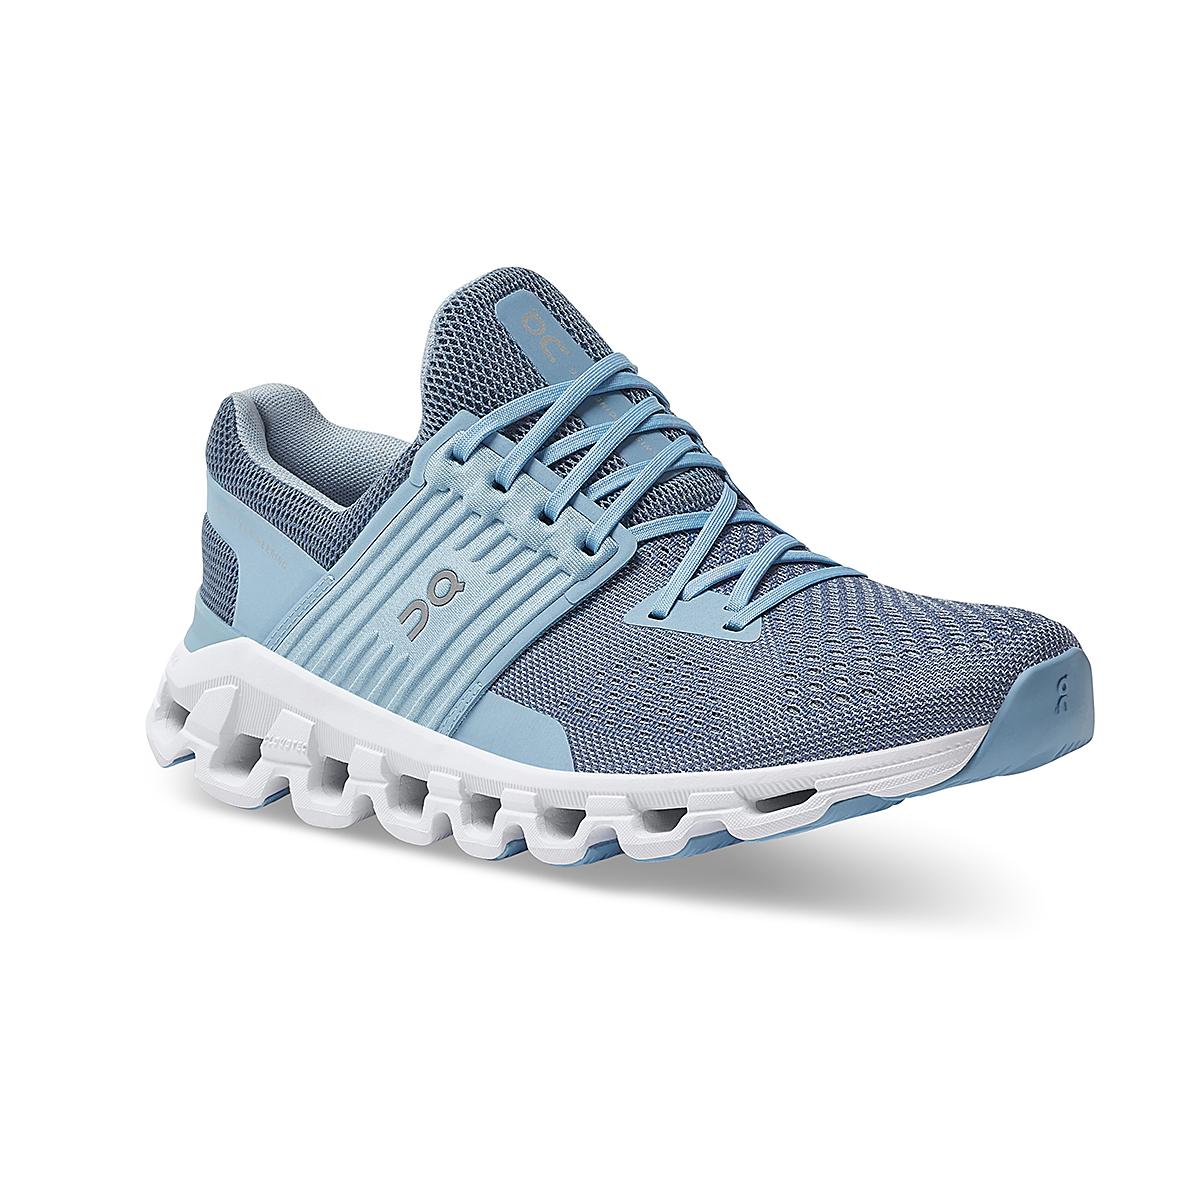 Women's On Cloudswift 2.0 Running Shoe - Color: Lake/Sky - Size: 5 - Width: Regular, Lake/Sky, large, image 2